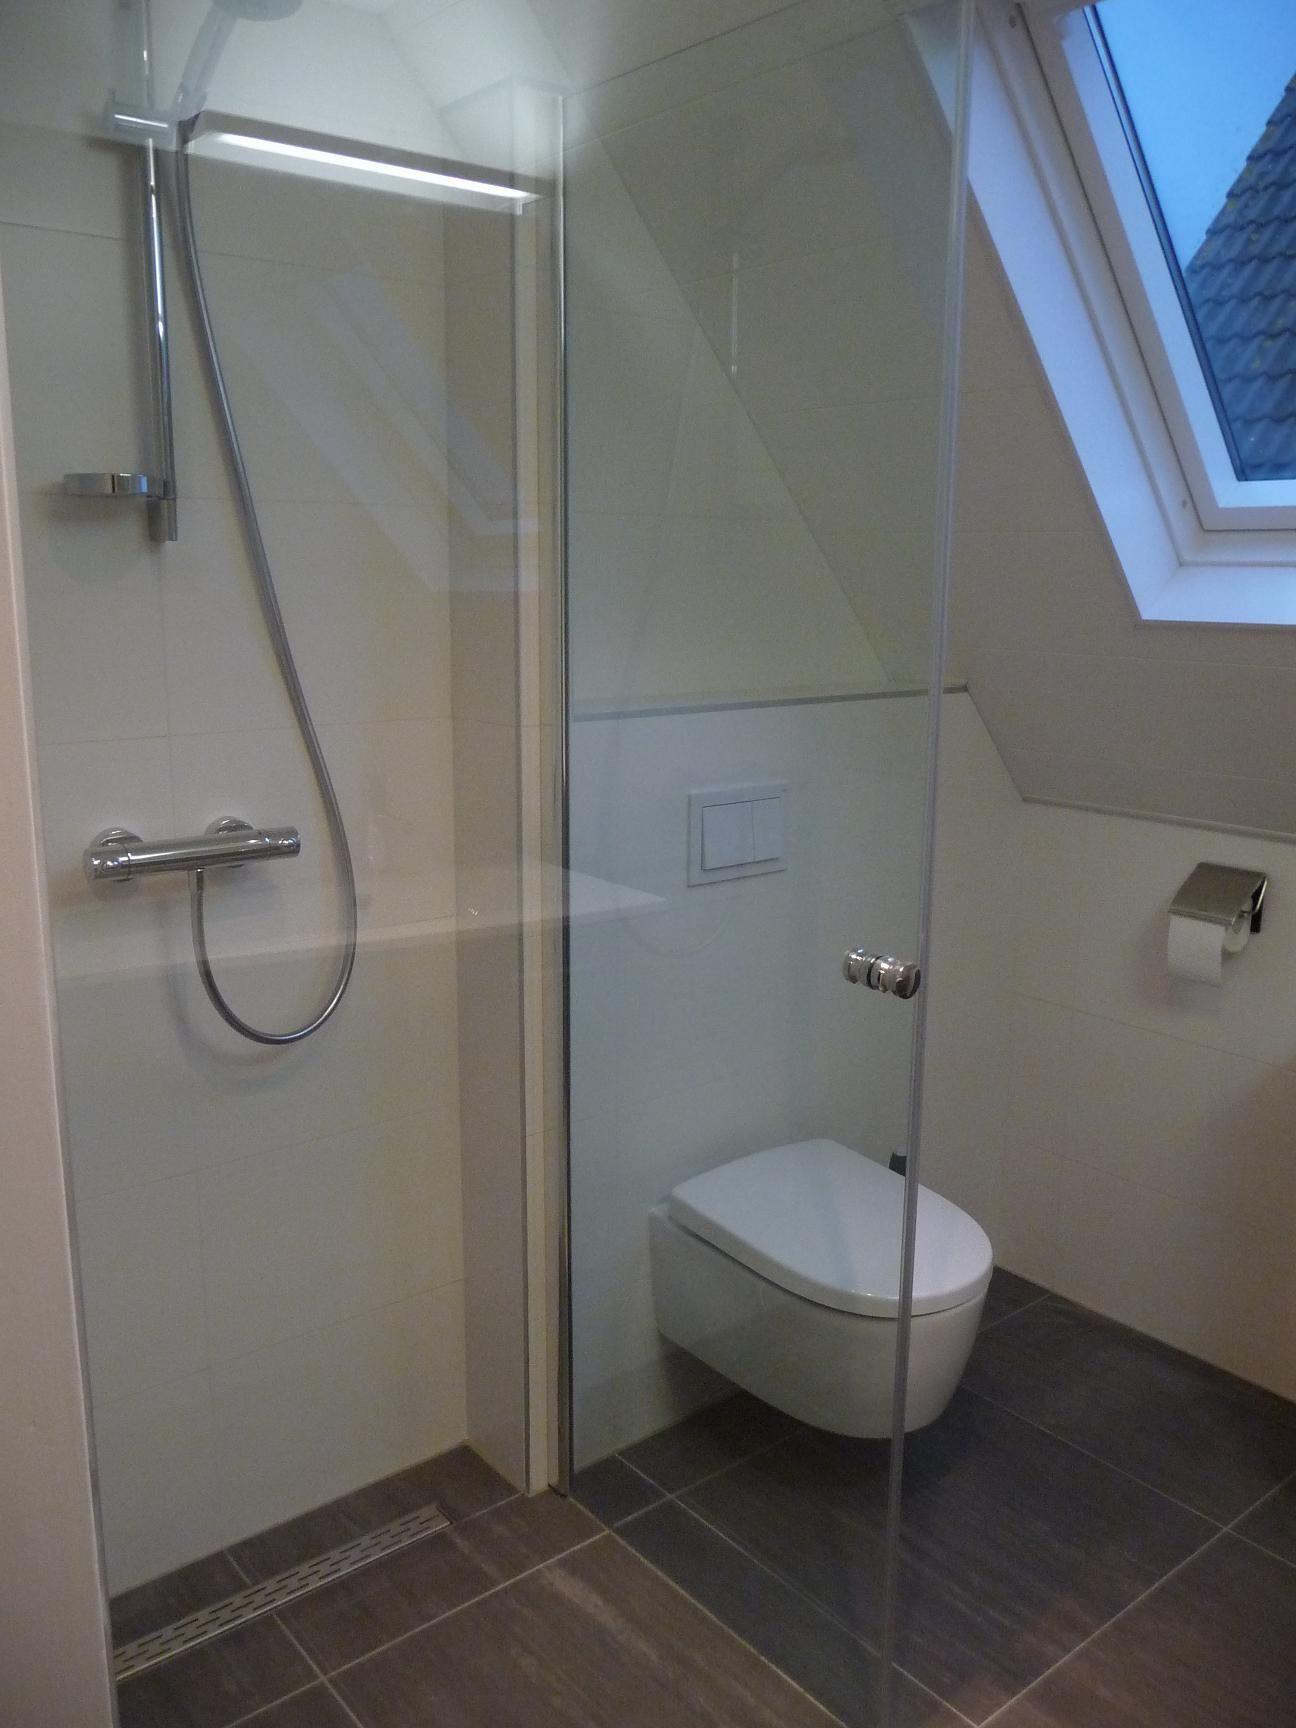 Erg kleine smalle badkamer schuin dak google zoeken badkamer pinterest bath interiors - Kleine badkamer met douche ...